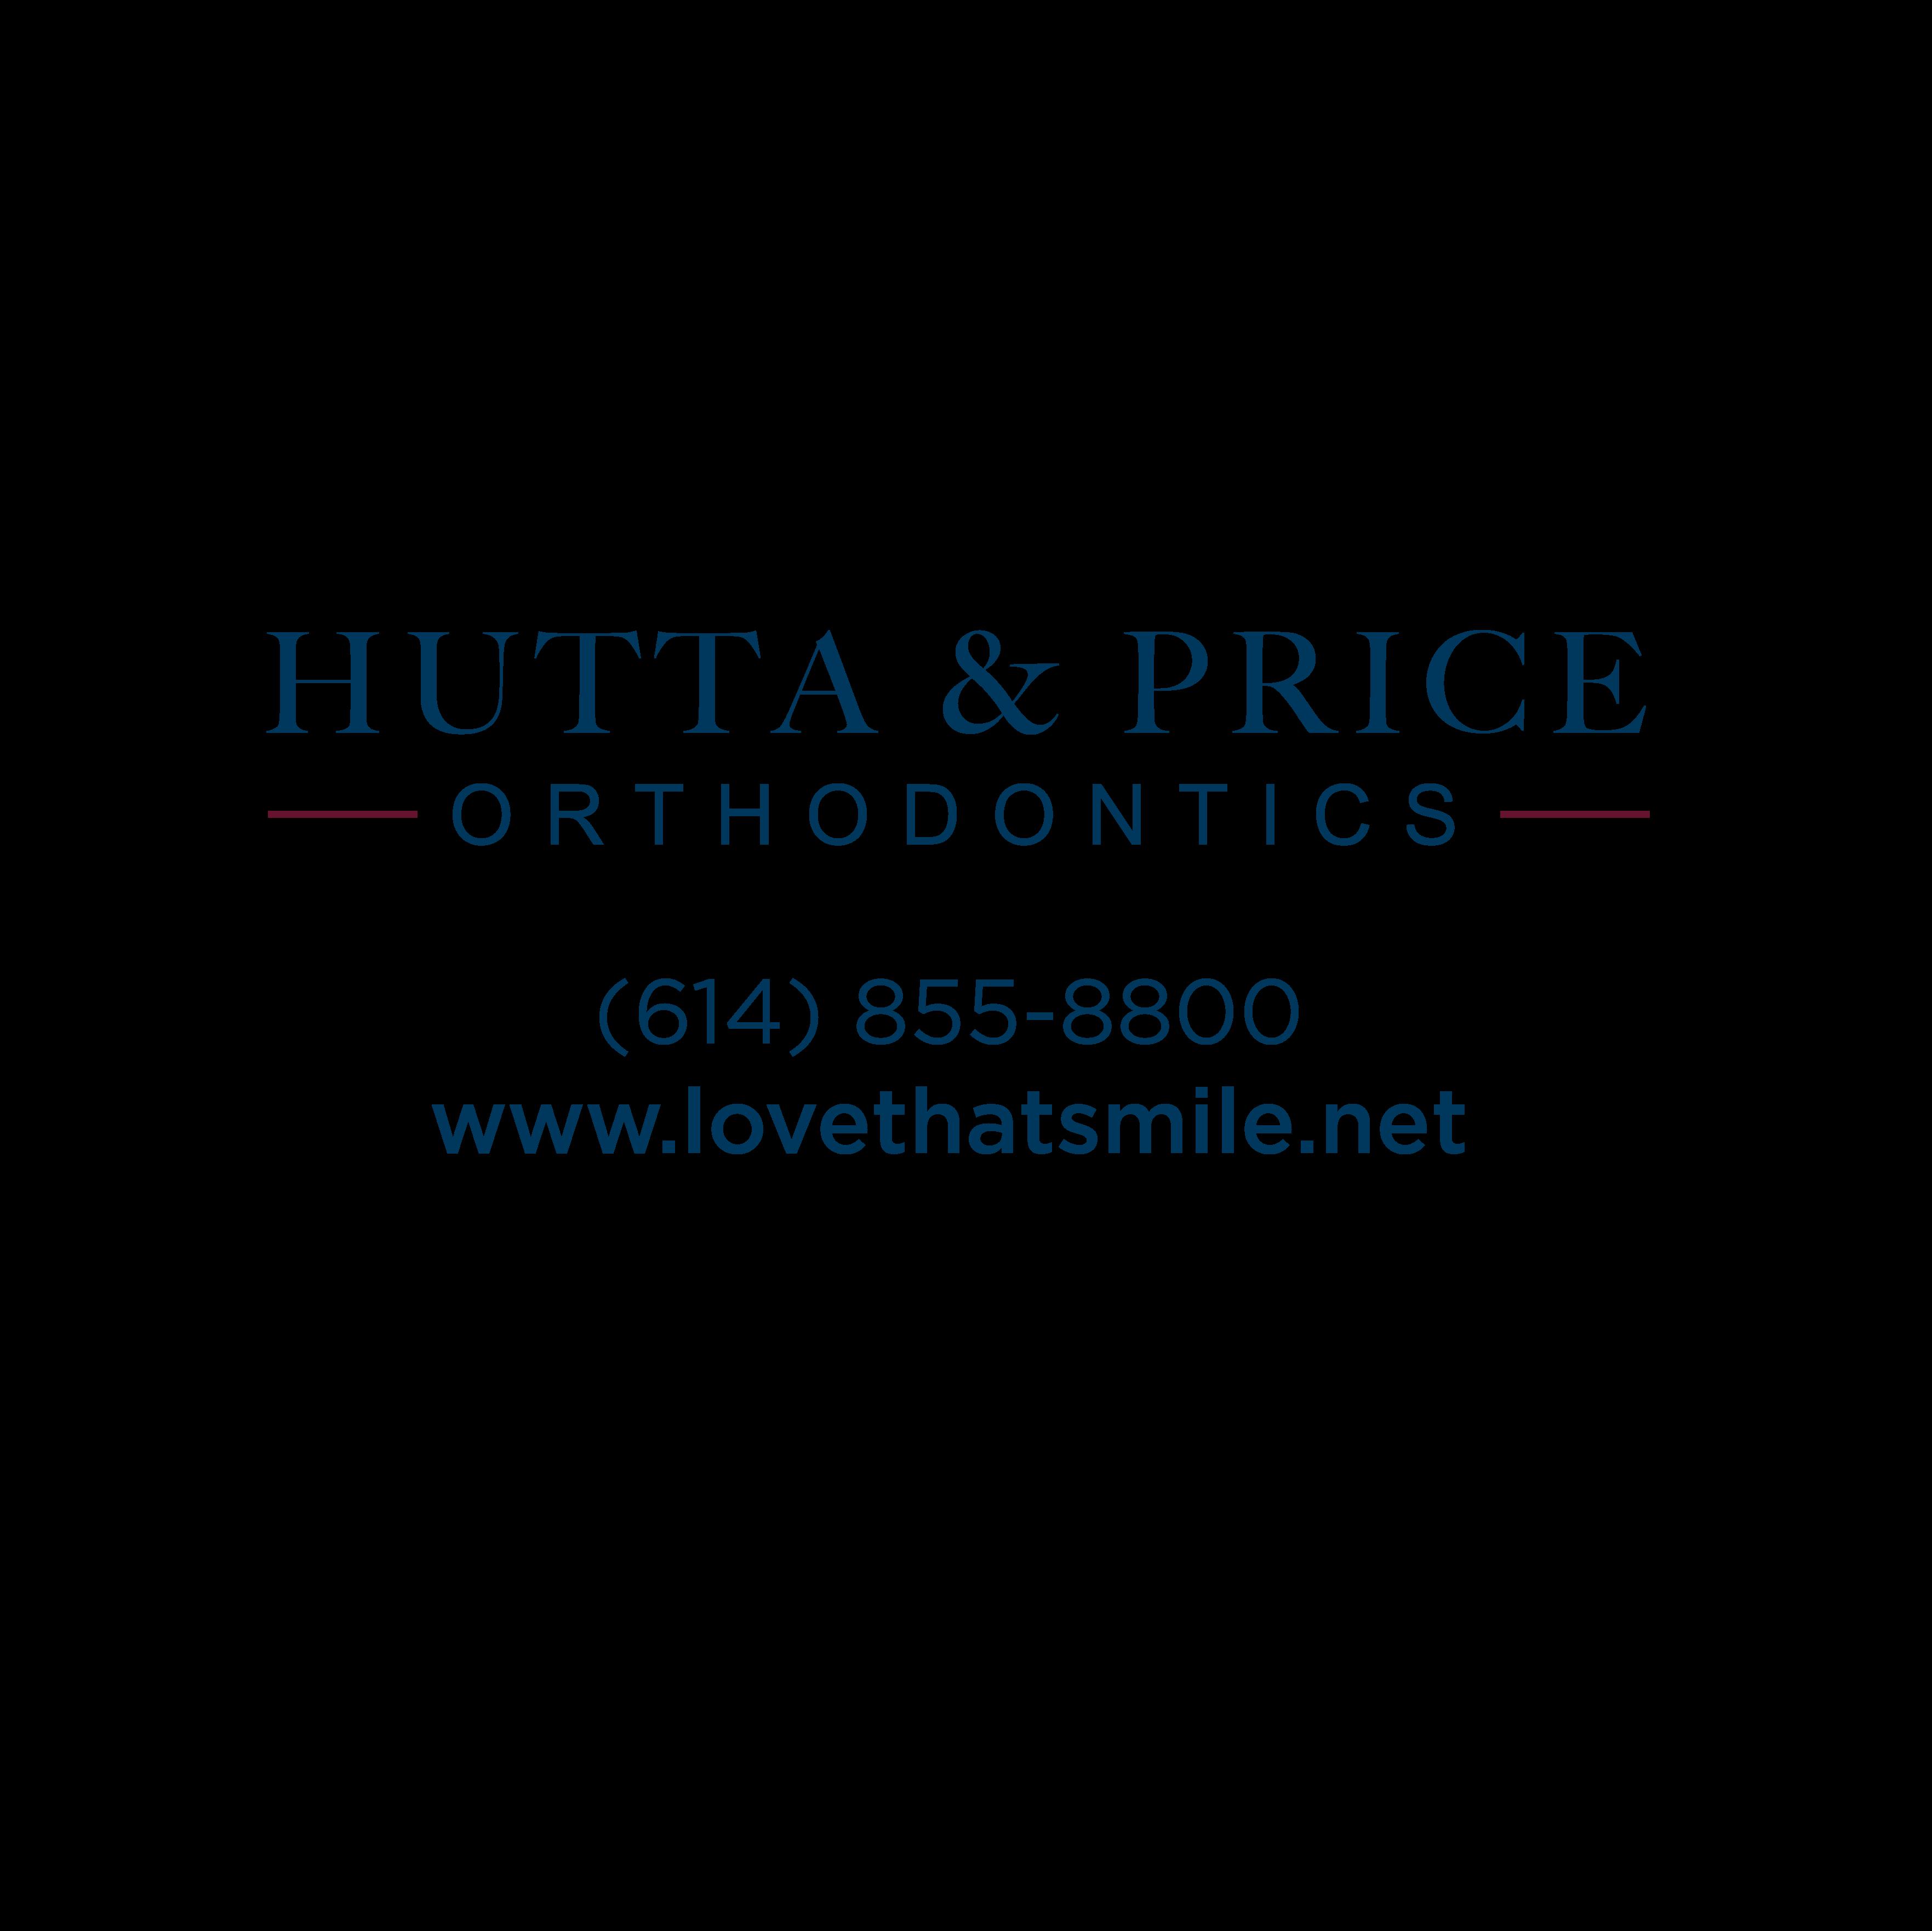 Hutta and Price Orthodontics